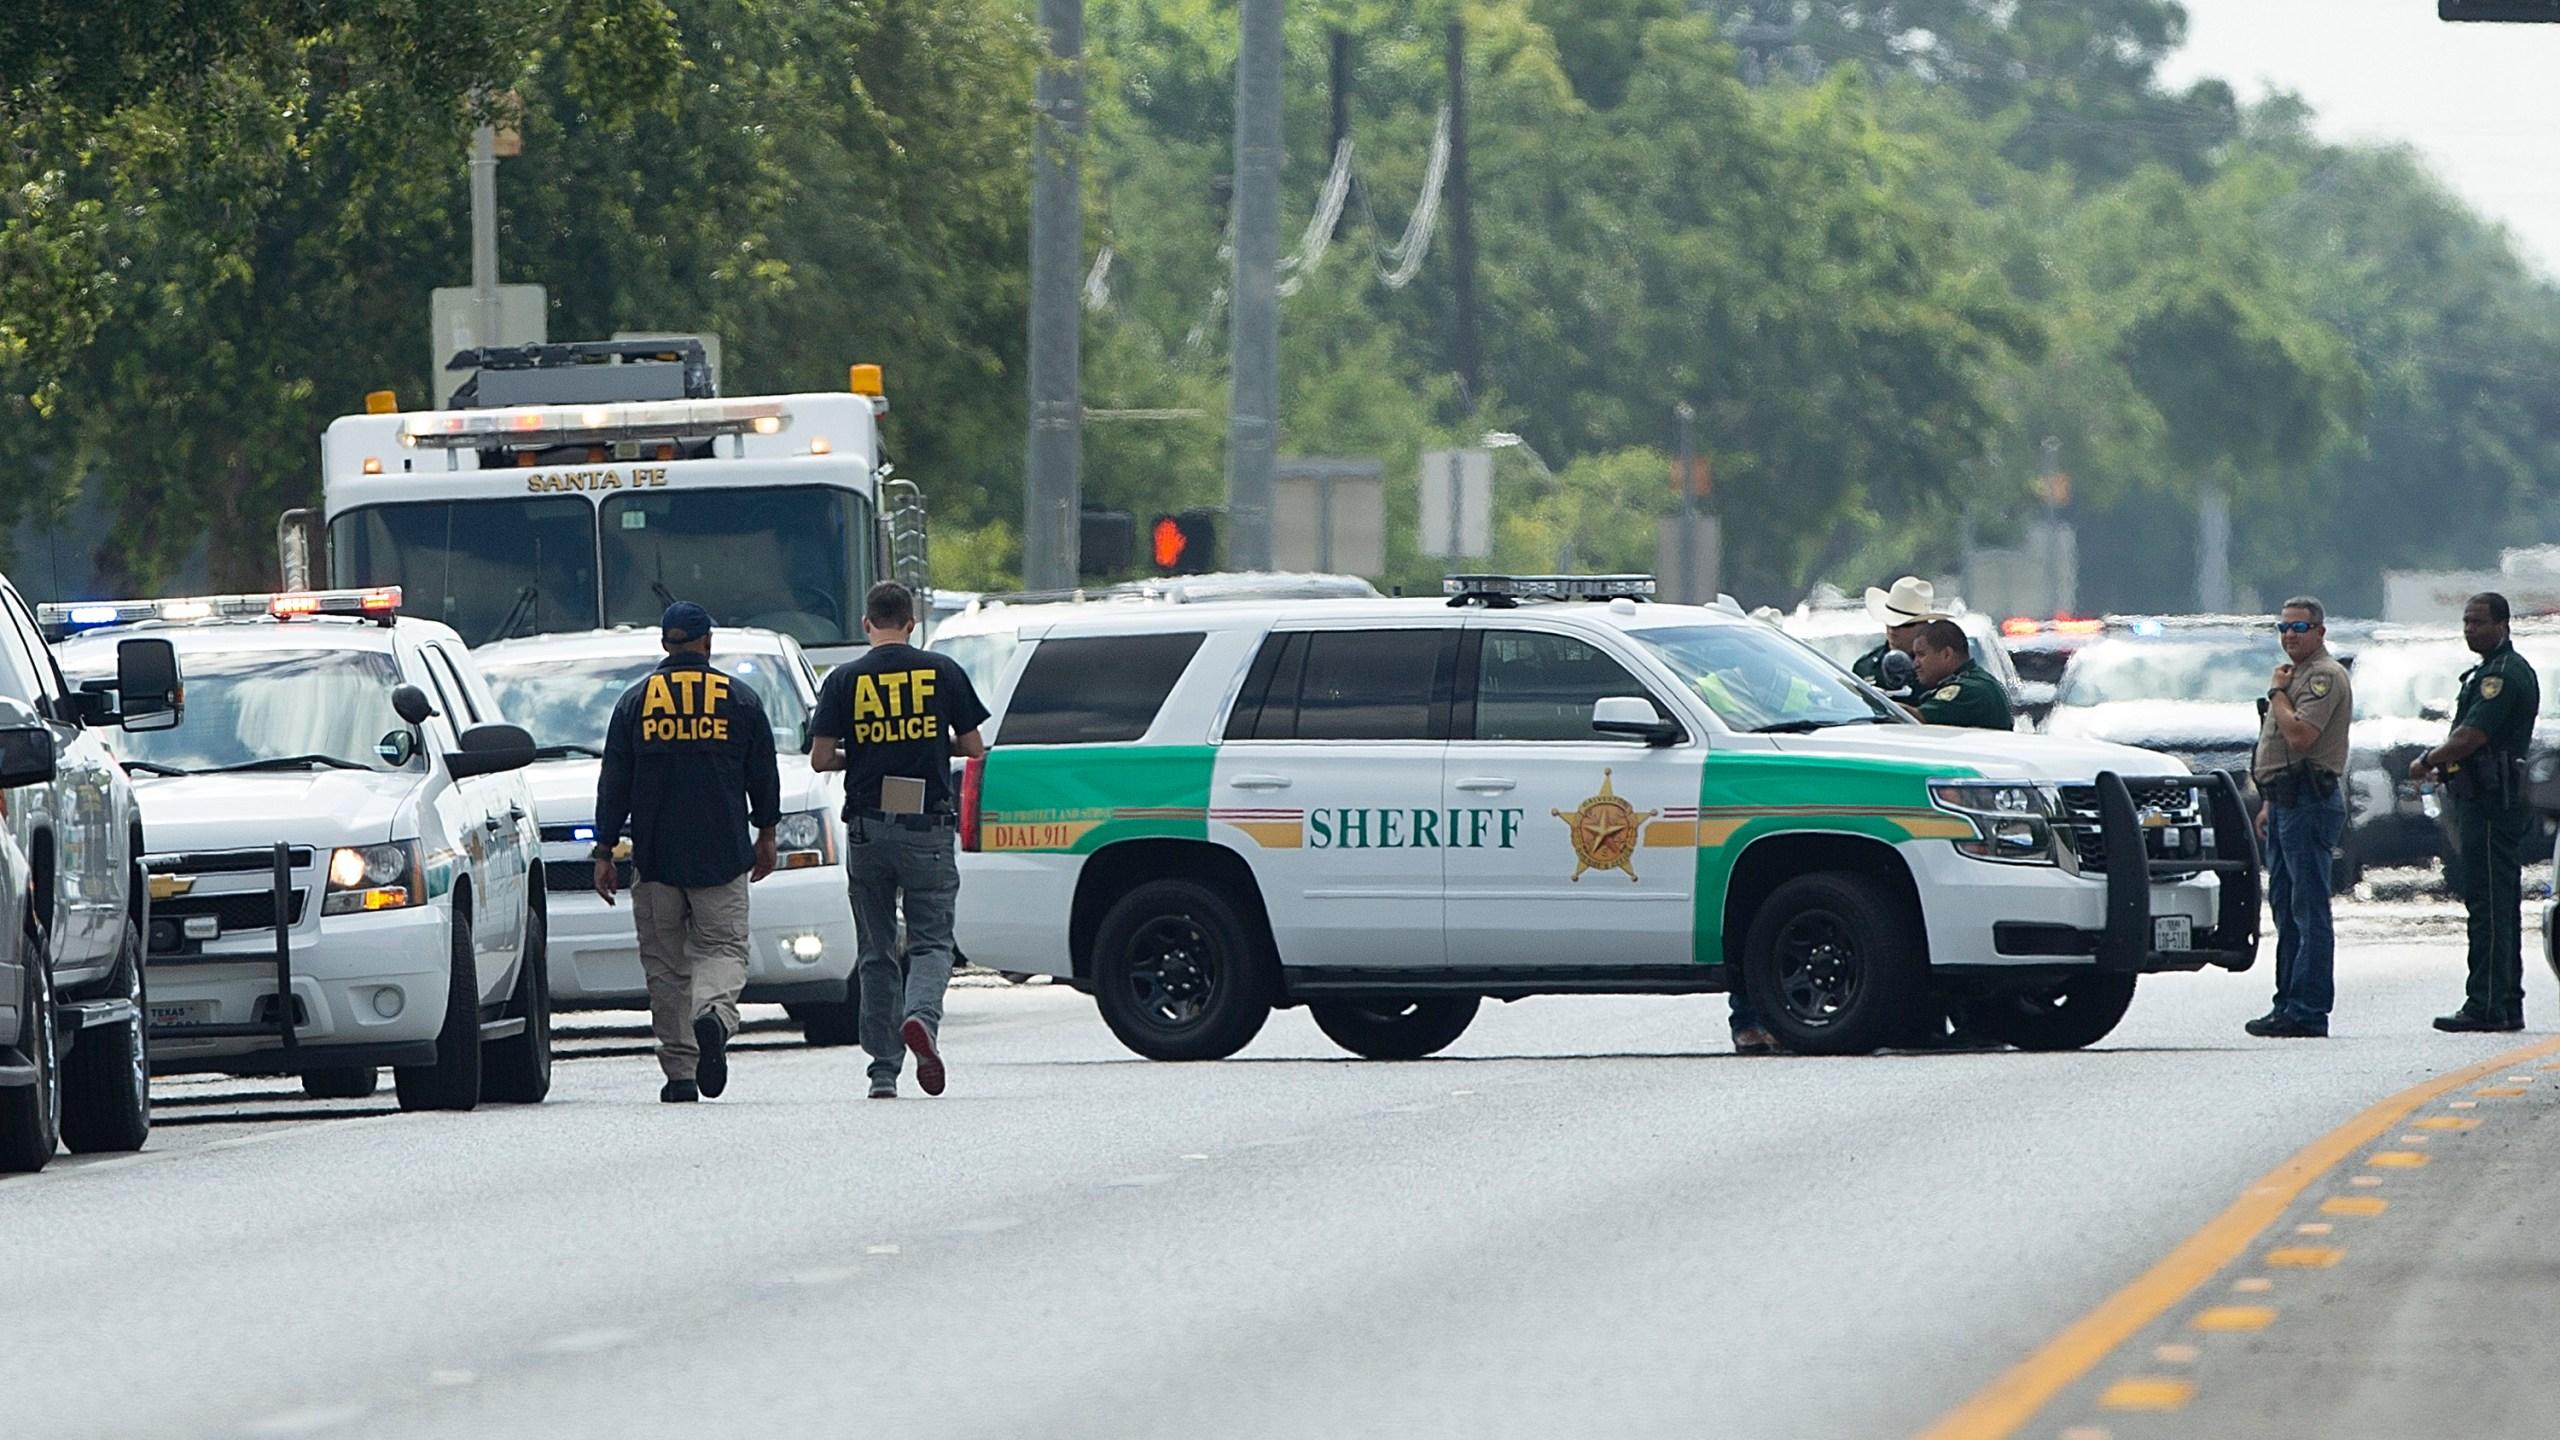 Santa Fe school shooting getty - ATF